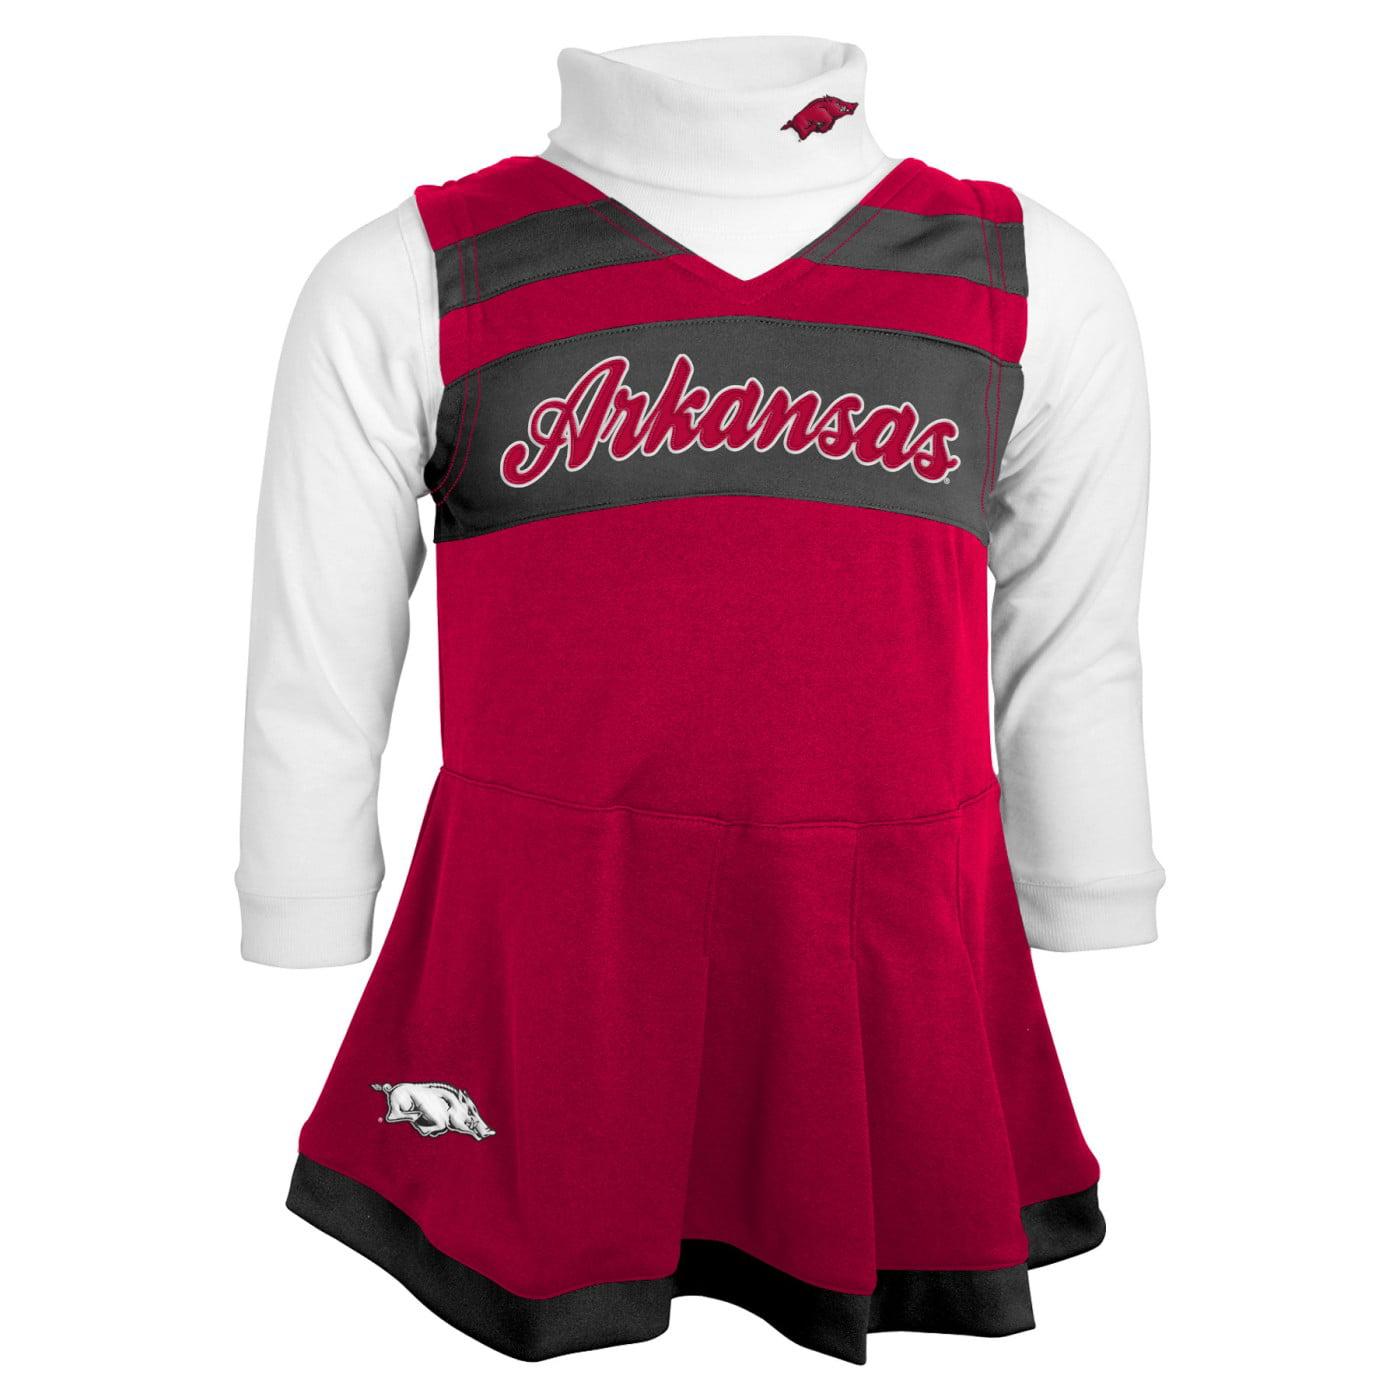 Arkansas Razorbacks NCAA Toddler Girls Cheer Jumper Dress Set w/ Turtleneck